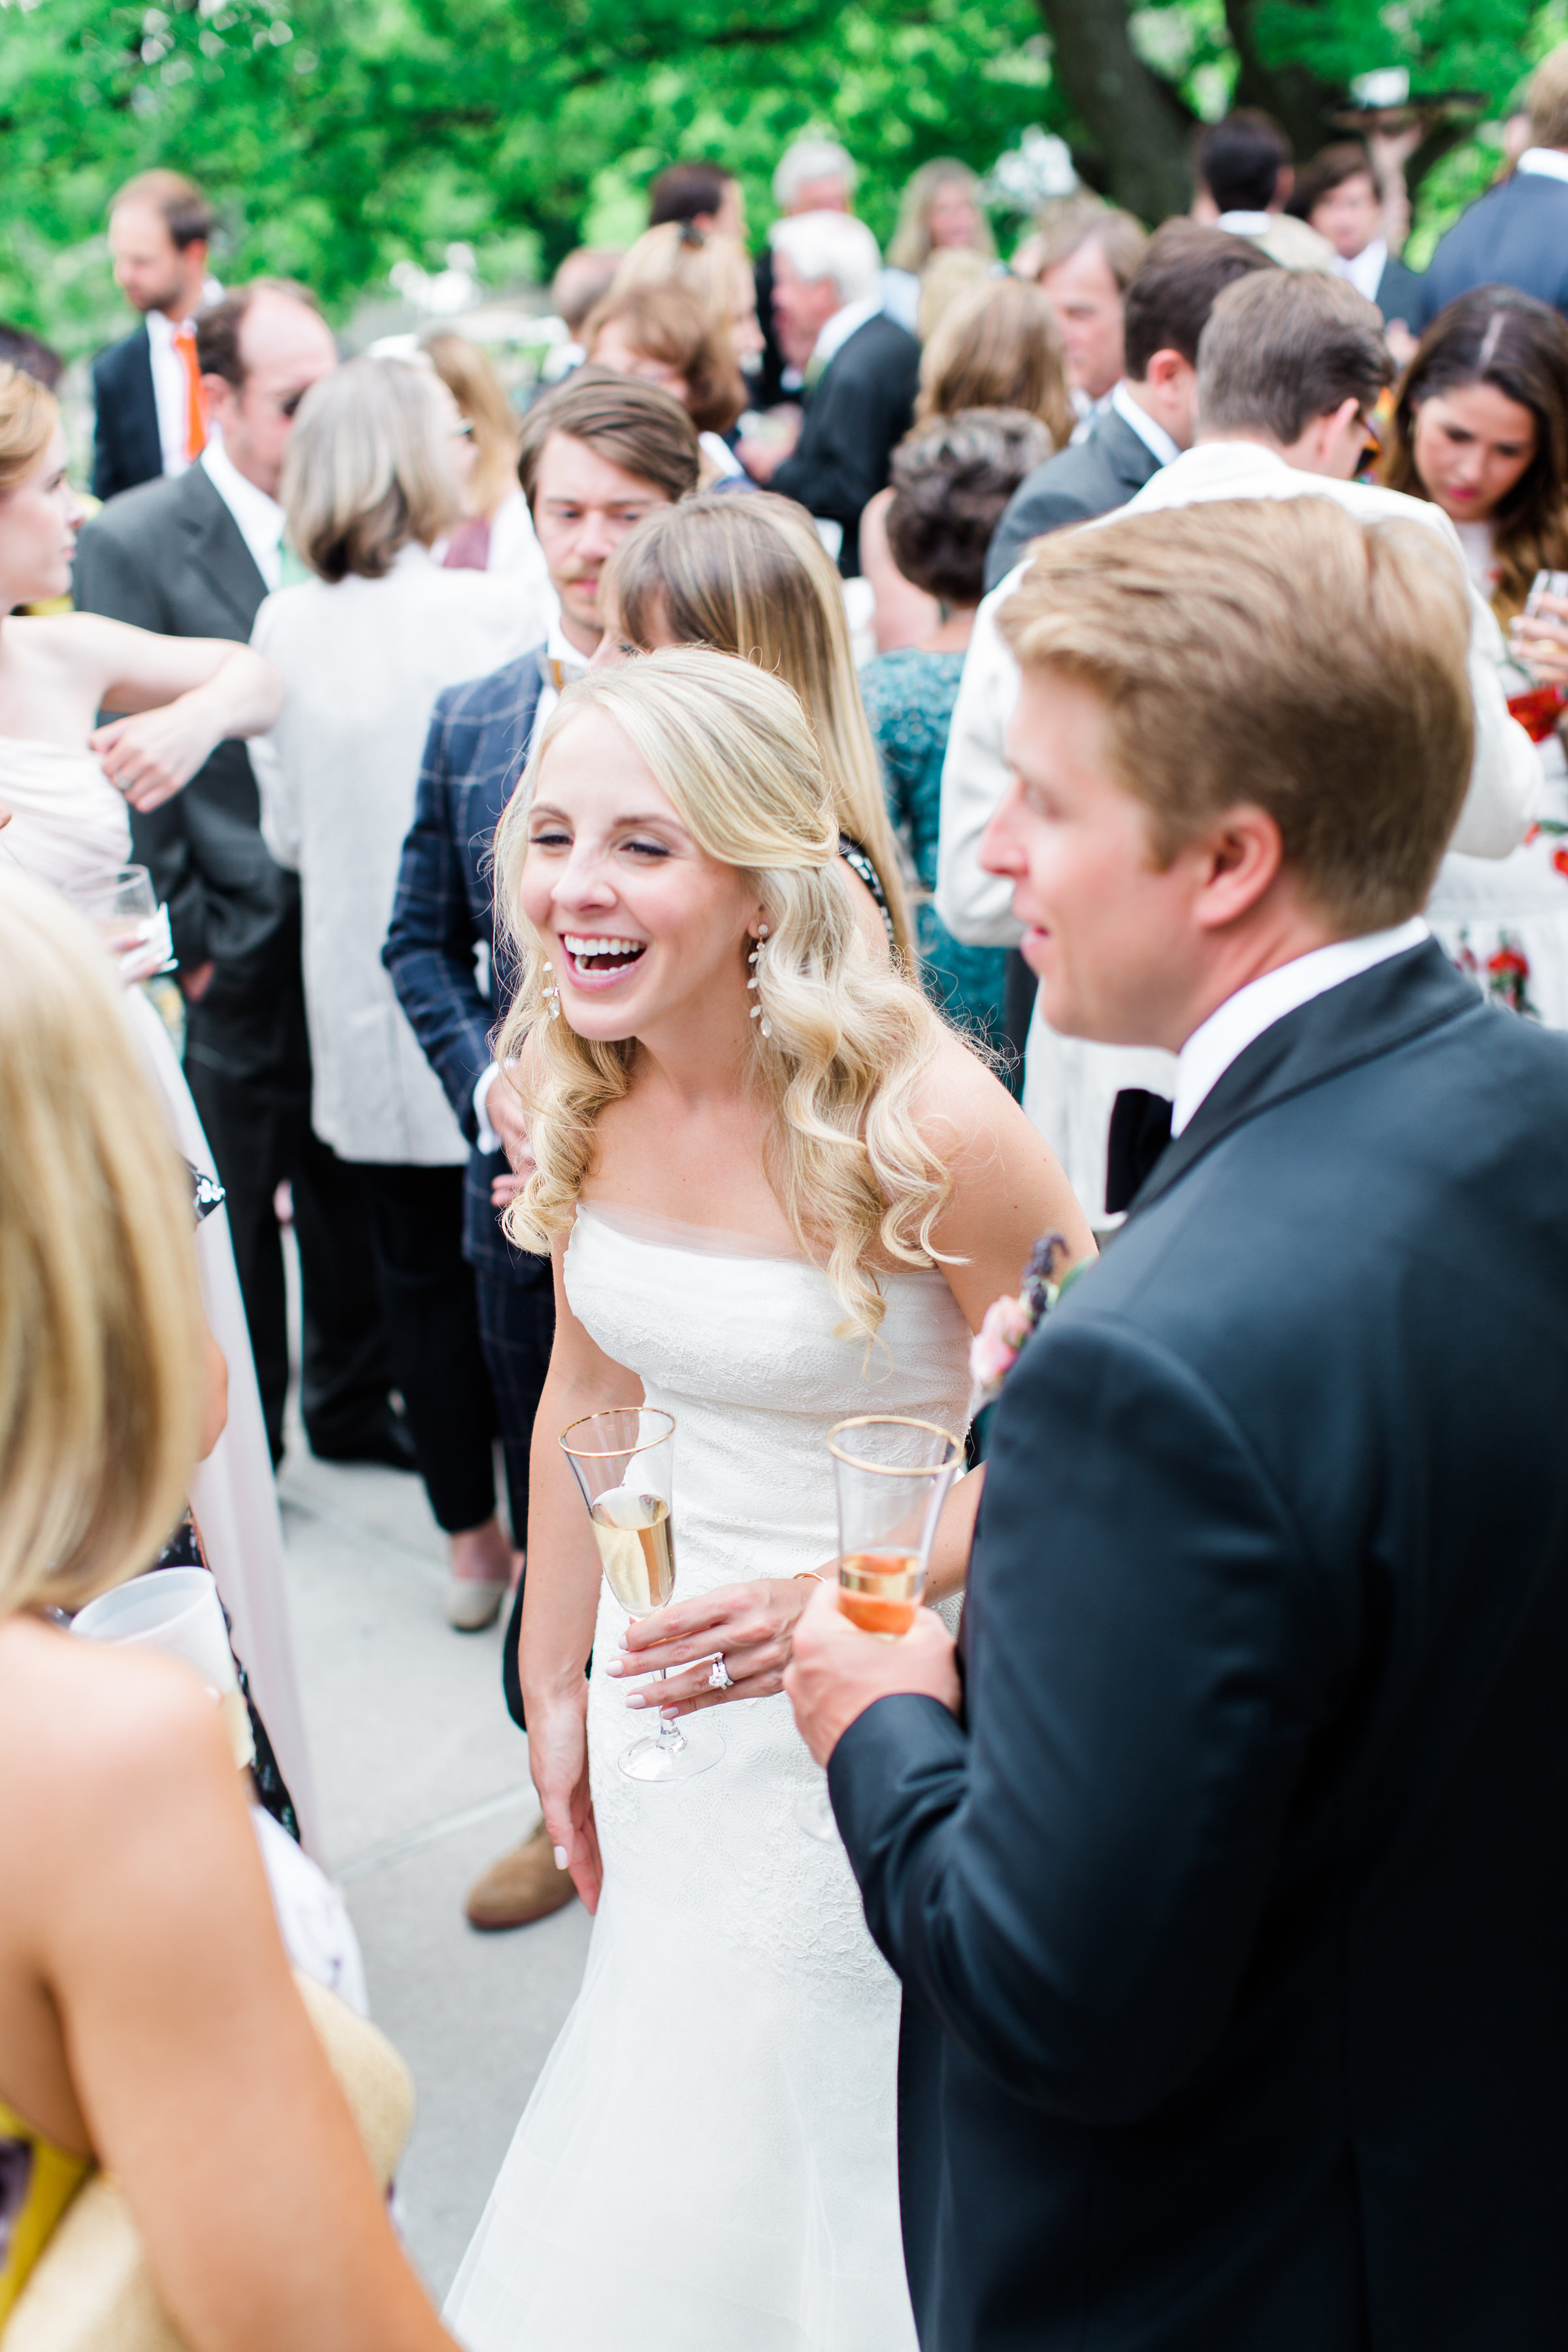 Coffman+Wedding+Cocktail+Hour-28.jpg